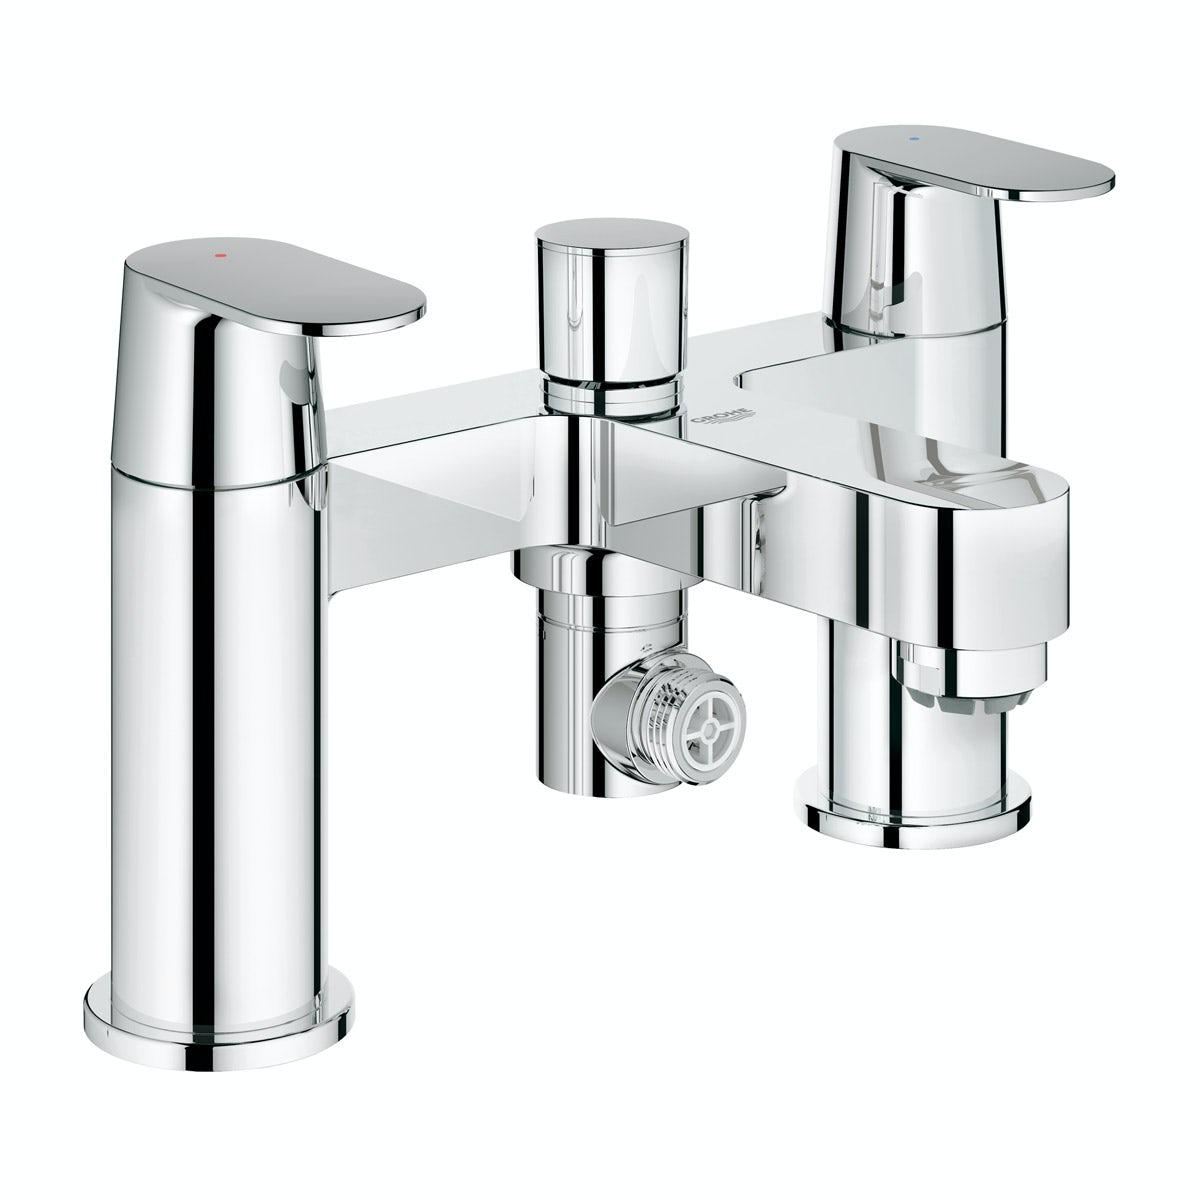 Grohe Eurosmart Cosmopolitan bath shower mixer tap